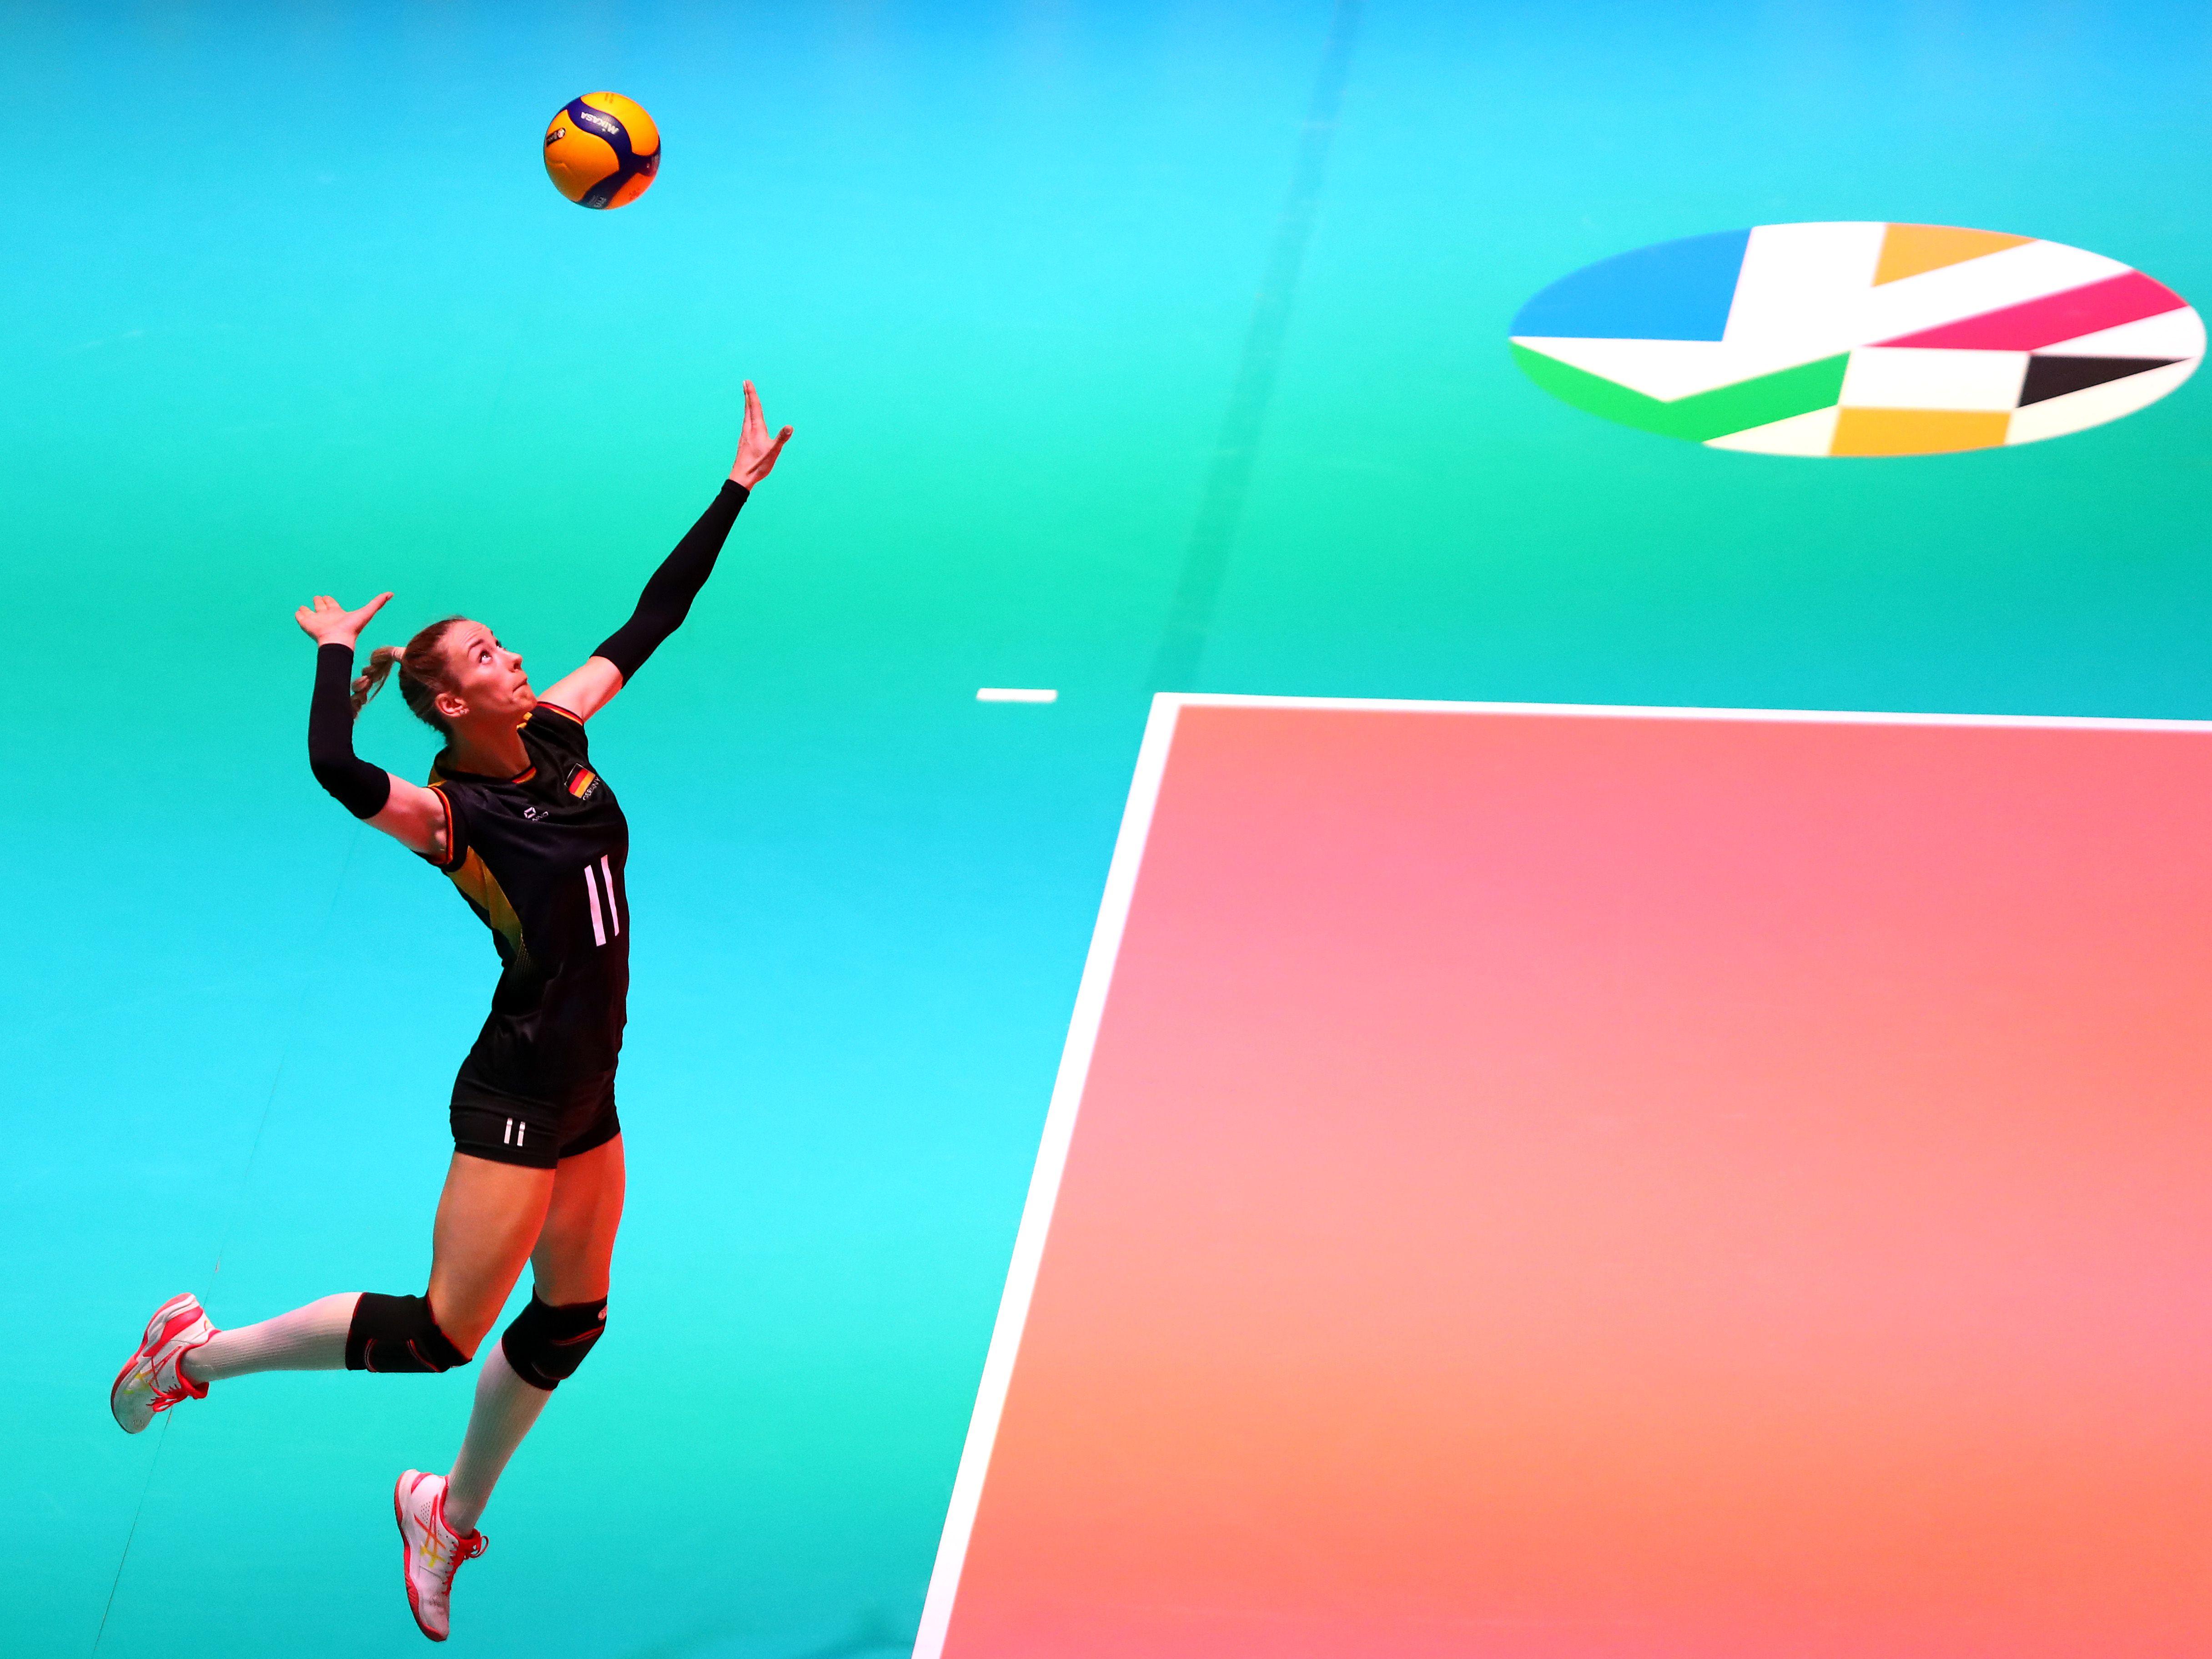 saque tenis voleibol que es